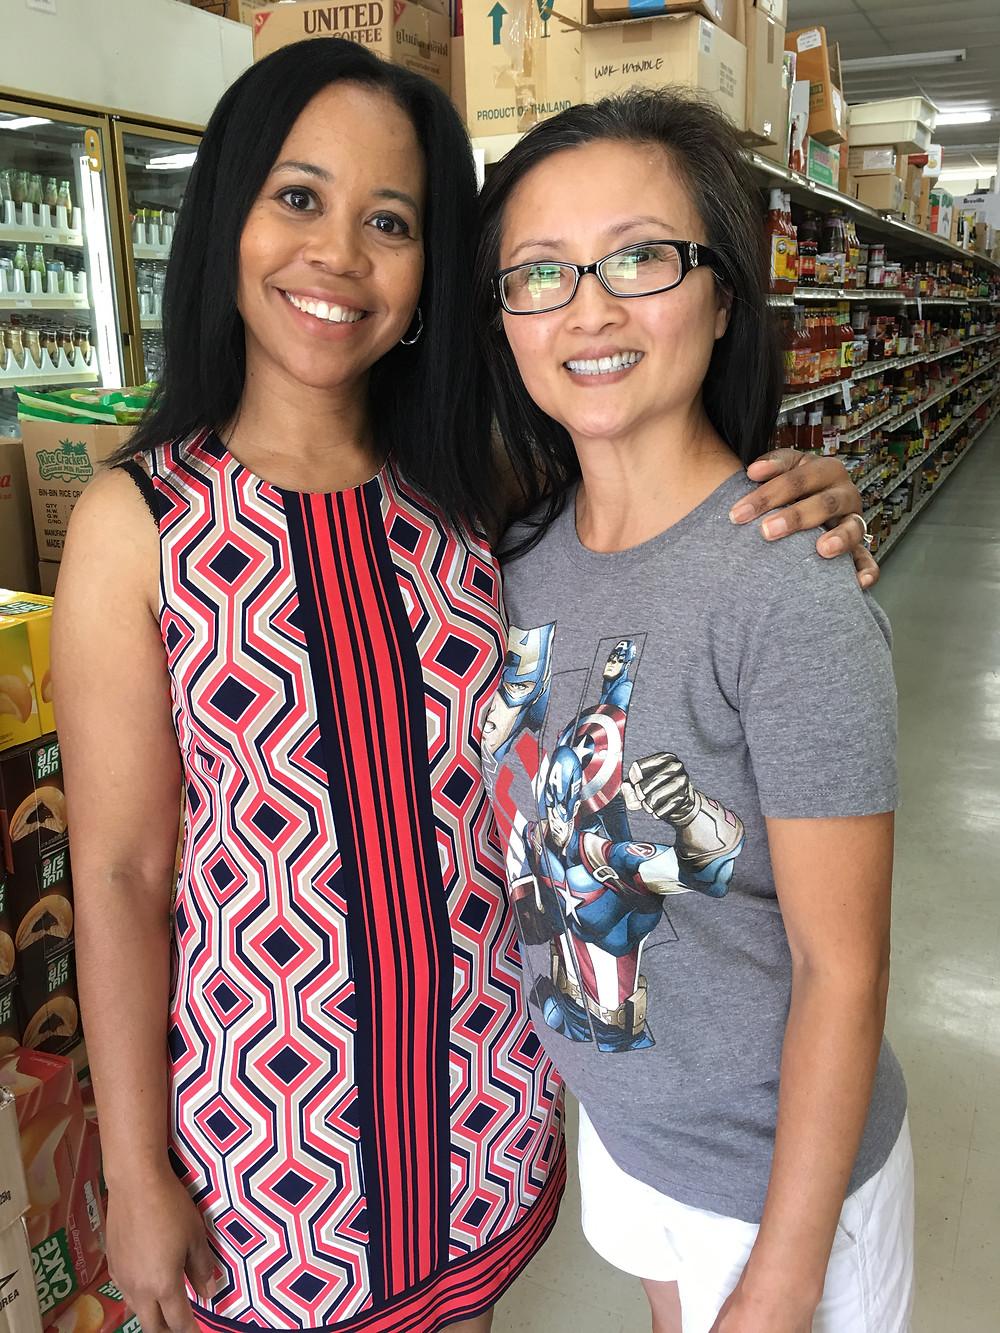 Lifelong friends spending time together at InterAsian Market & Deli